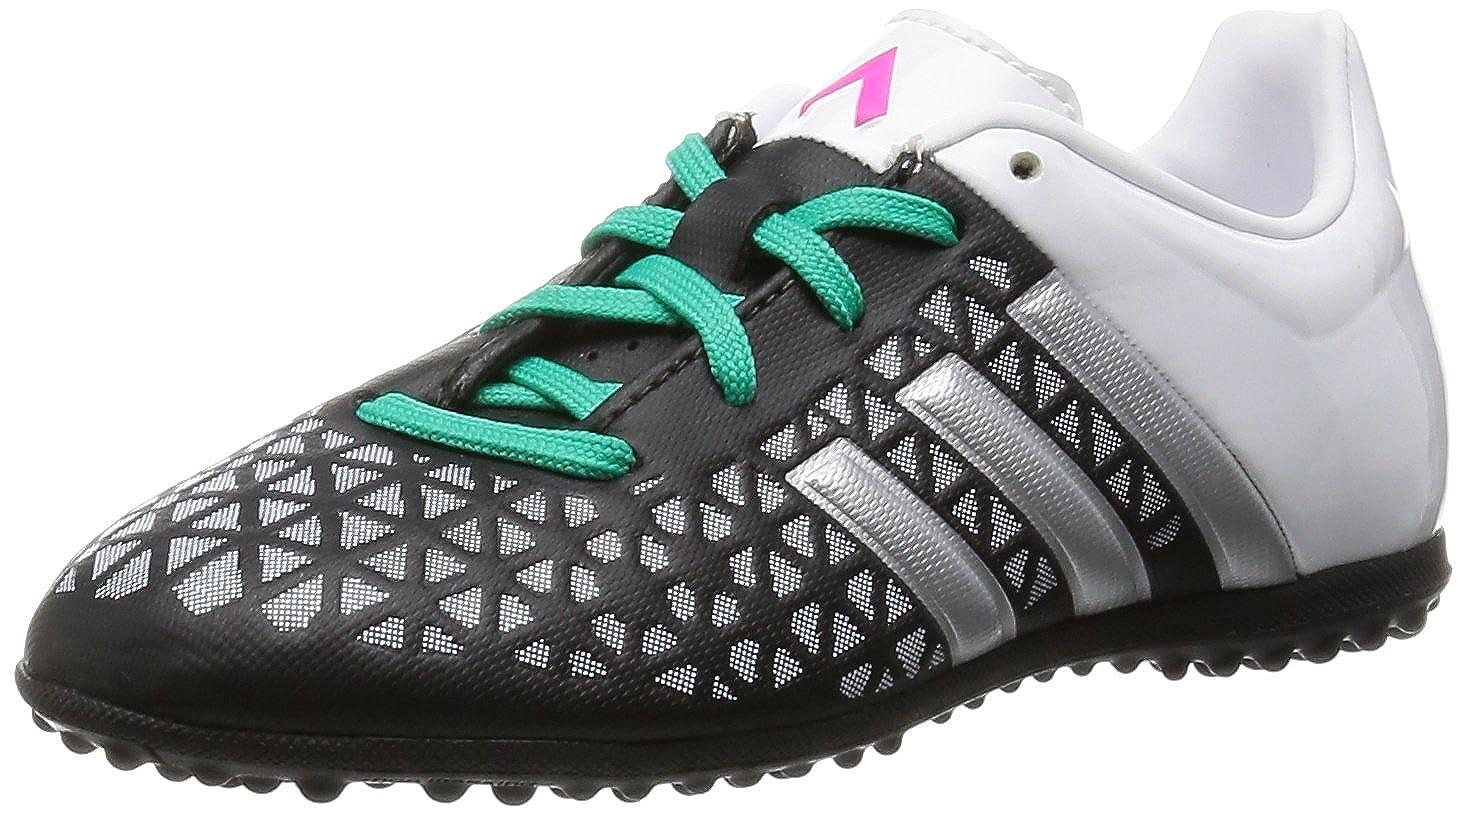 Adidas Unisex-Kinder Ace 15.3 Tf Fußballschuhe